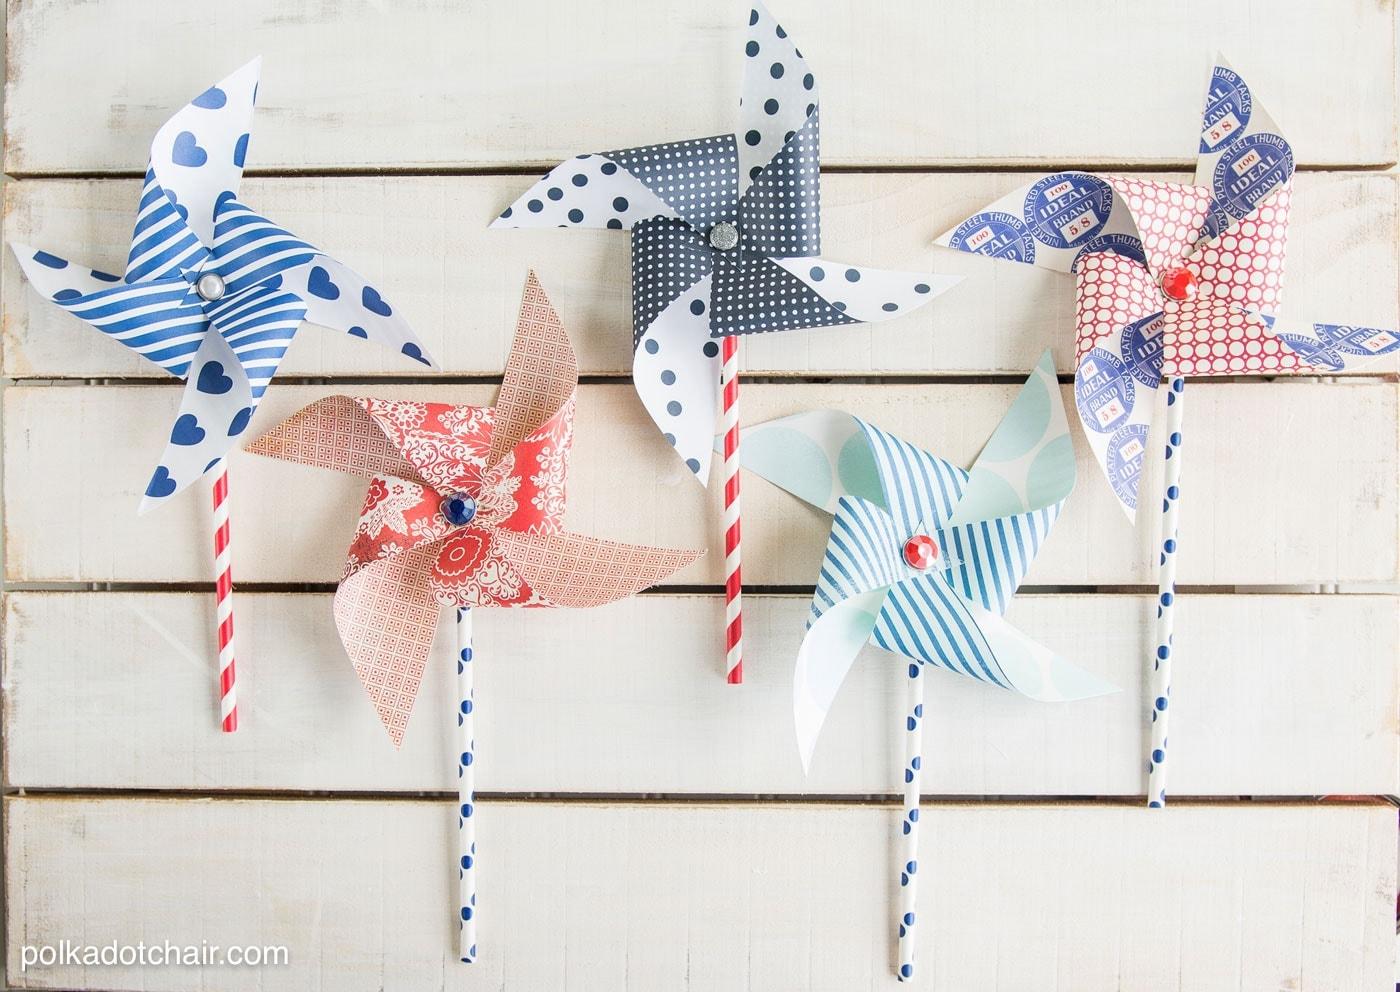 How To Make Paper Pinwheels The Polka Dot Chair